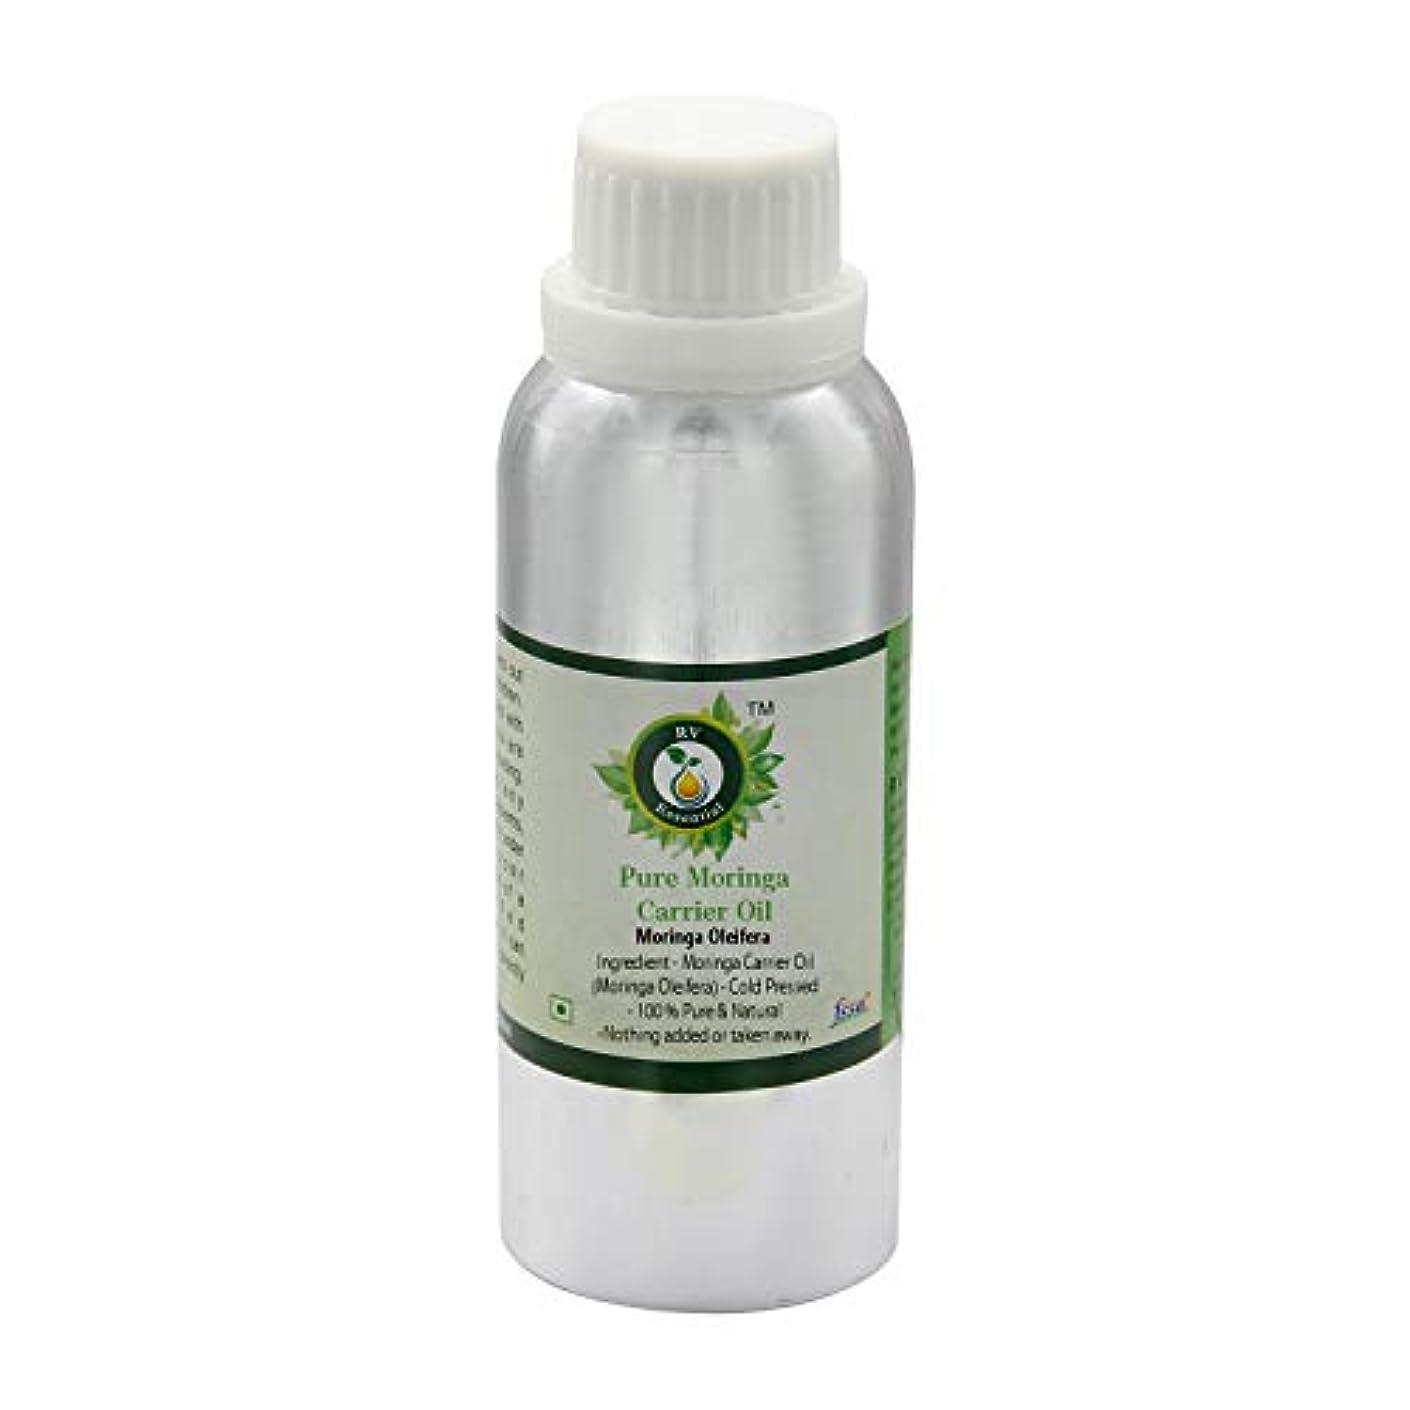 R V Essential 純粋なモリンガキャリアオイル630ml (21oz)- Moringa Oleifera (100%ピュア&ナチュラルコールドPressed) Pure Moringa Carrier Oil